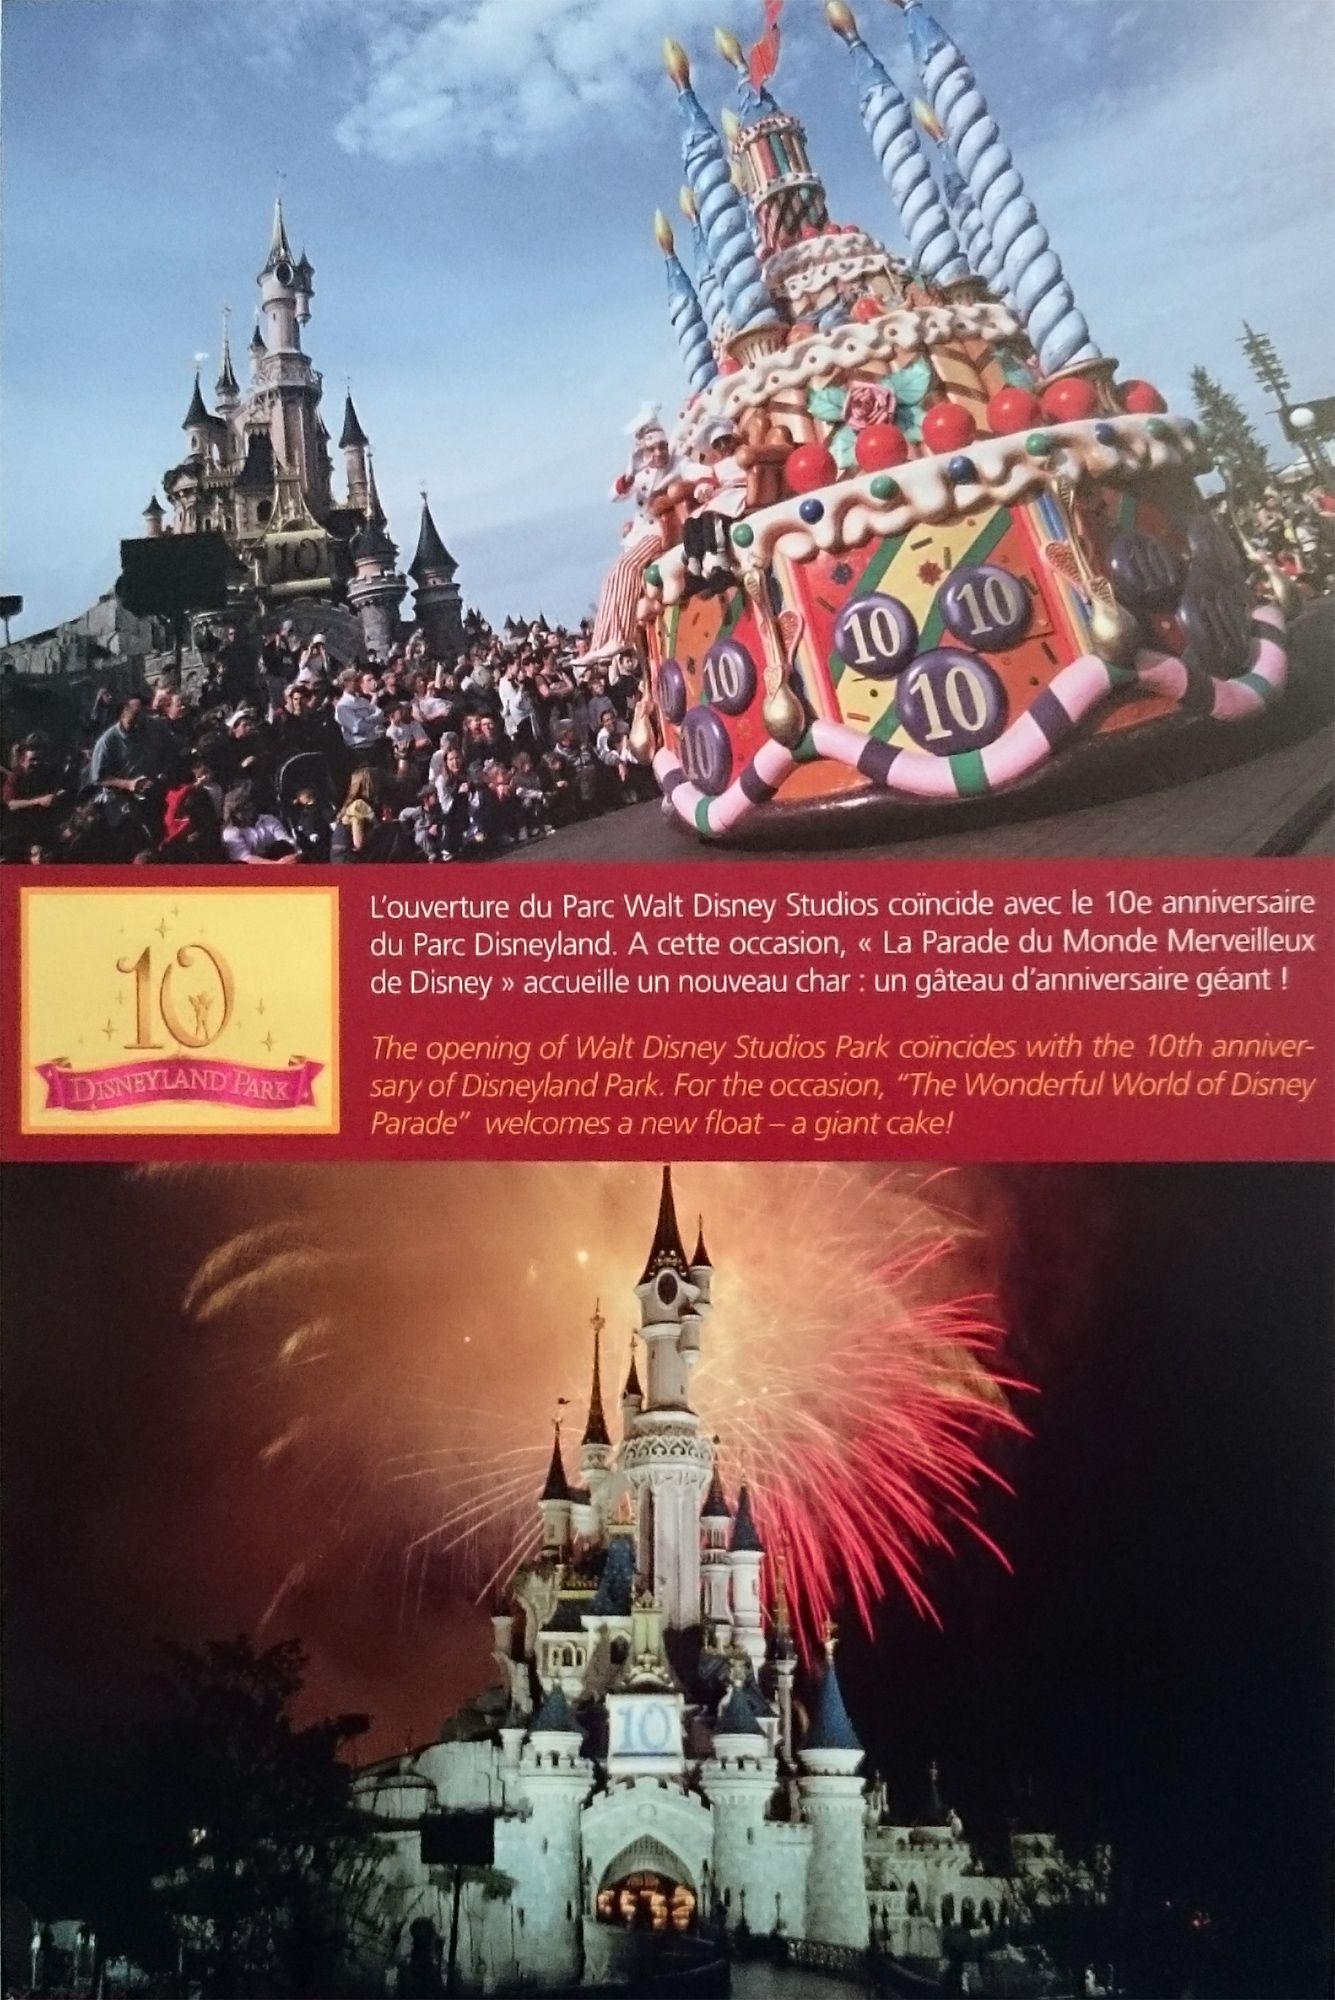 Disneyland Paris 10th Anniversary